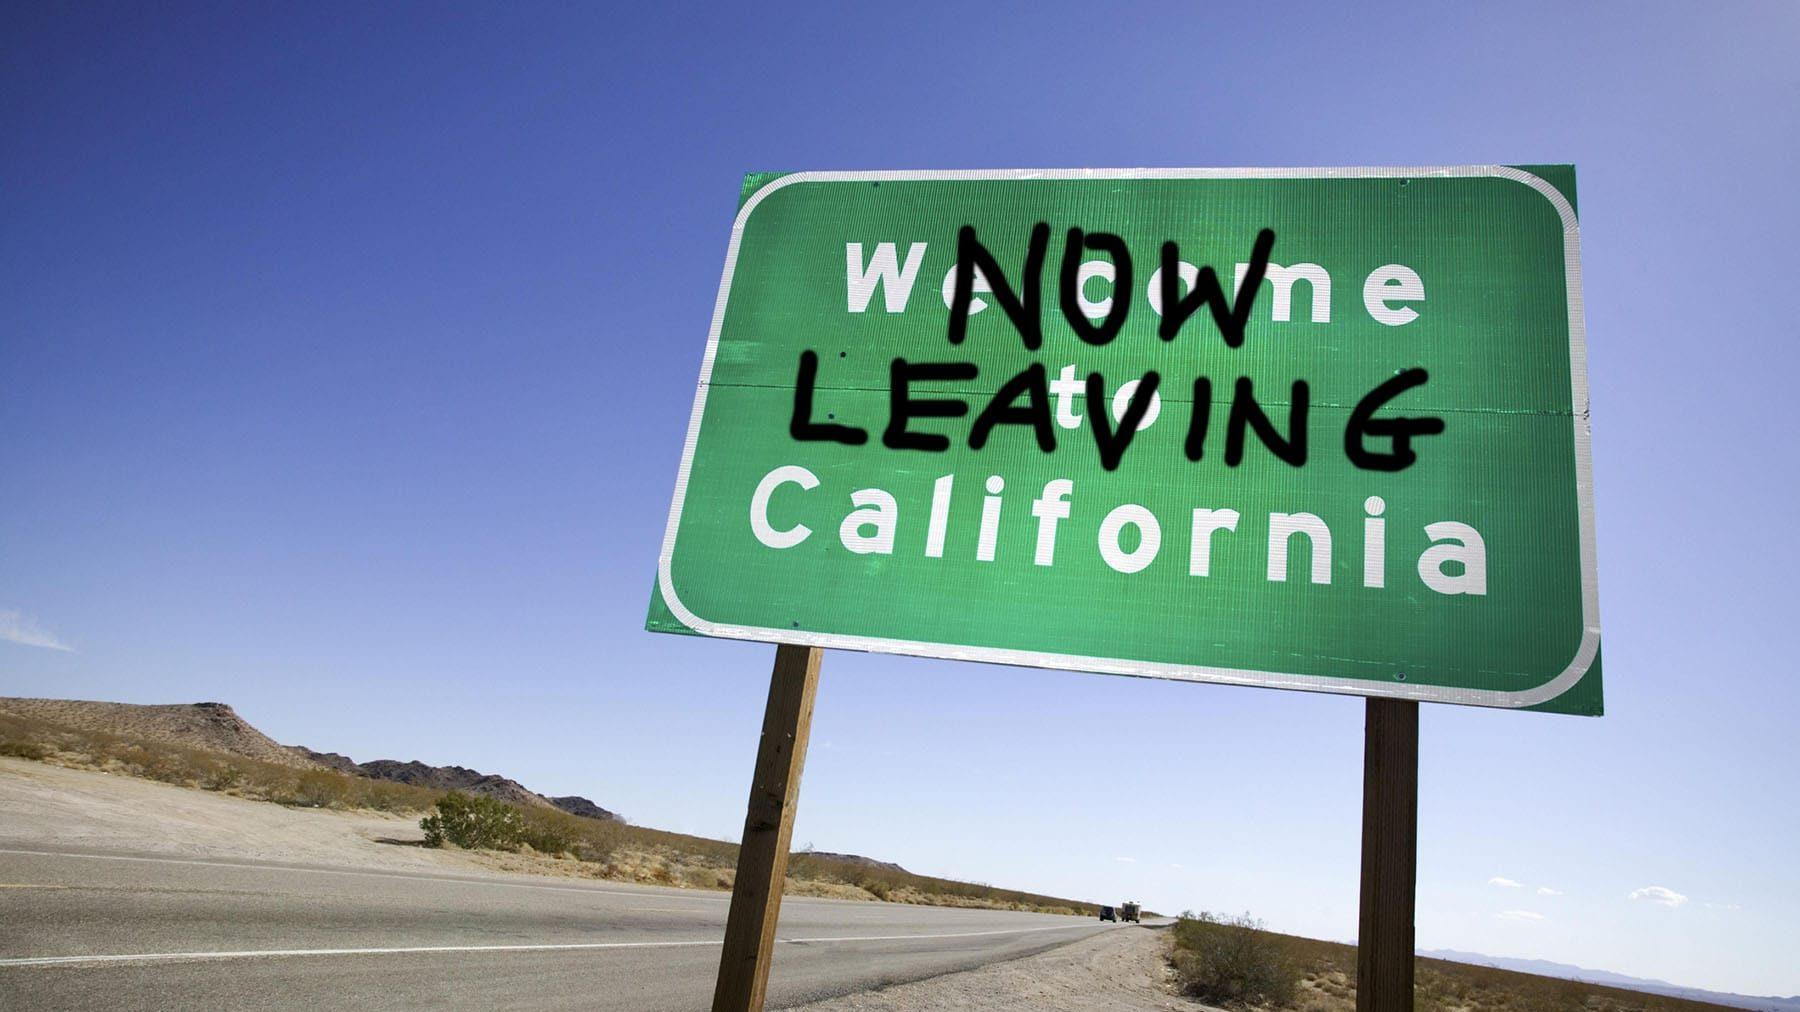 Foto notícia - Califórnia